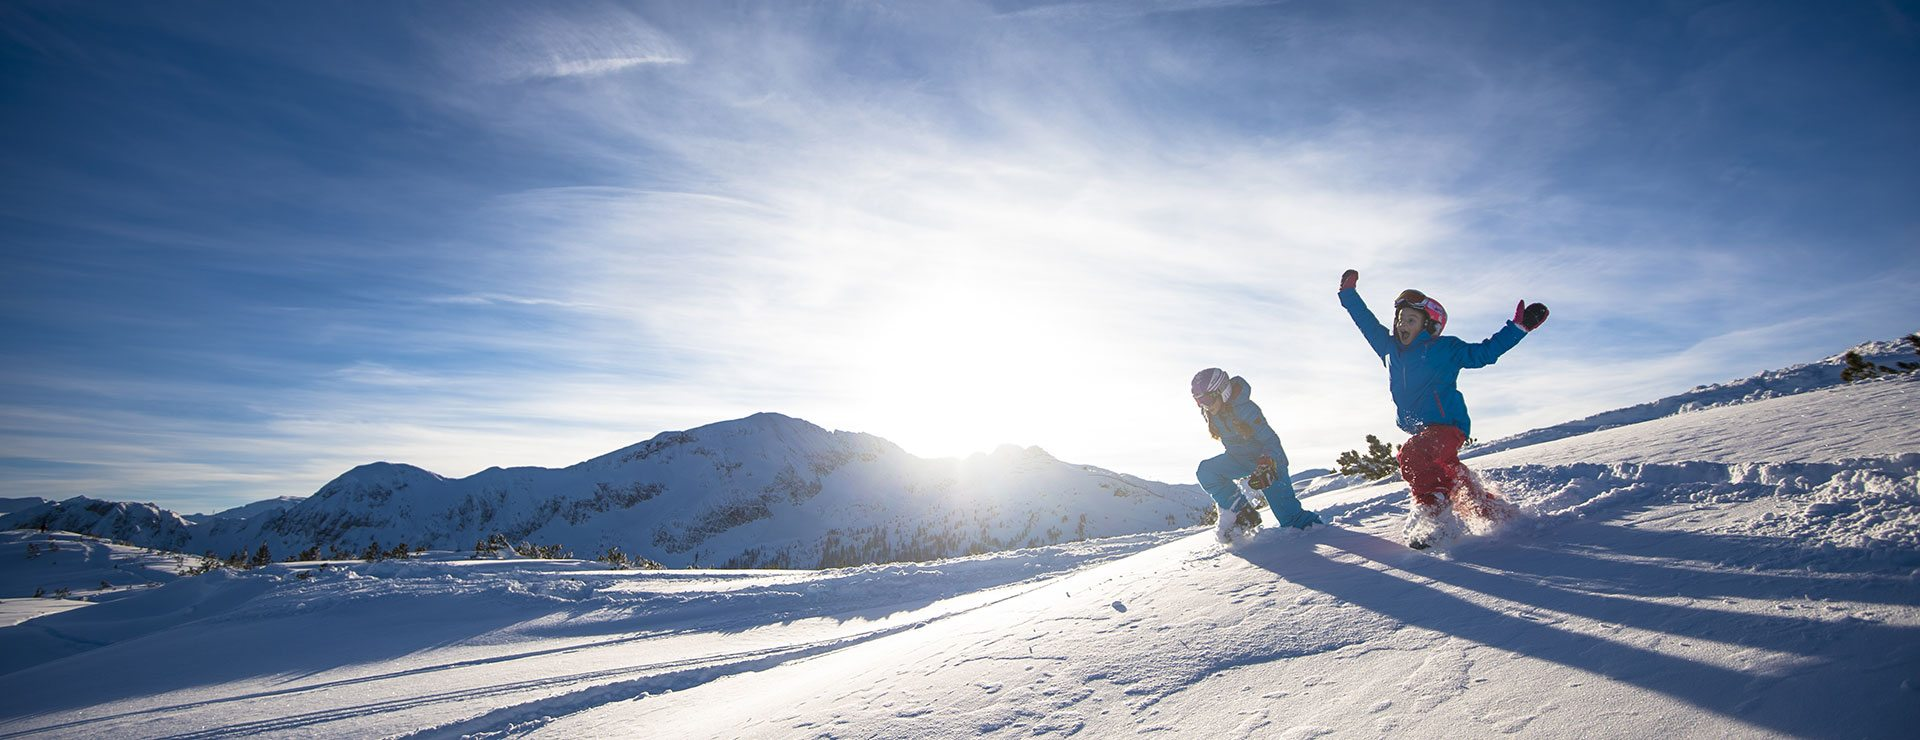 Ski- & Winterurlaub in Ski amadé